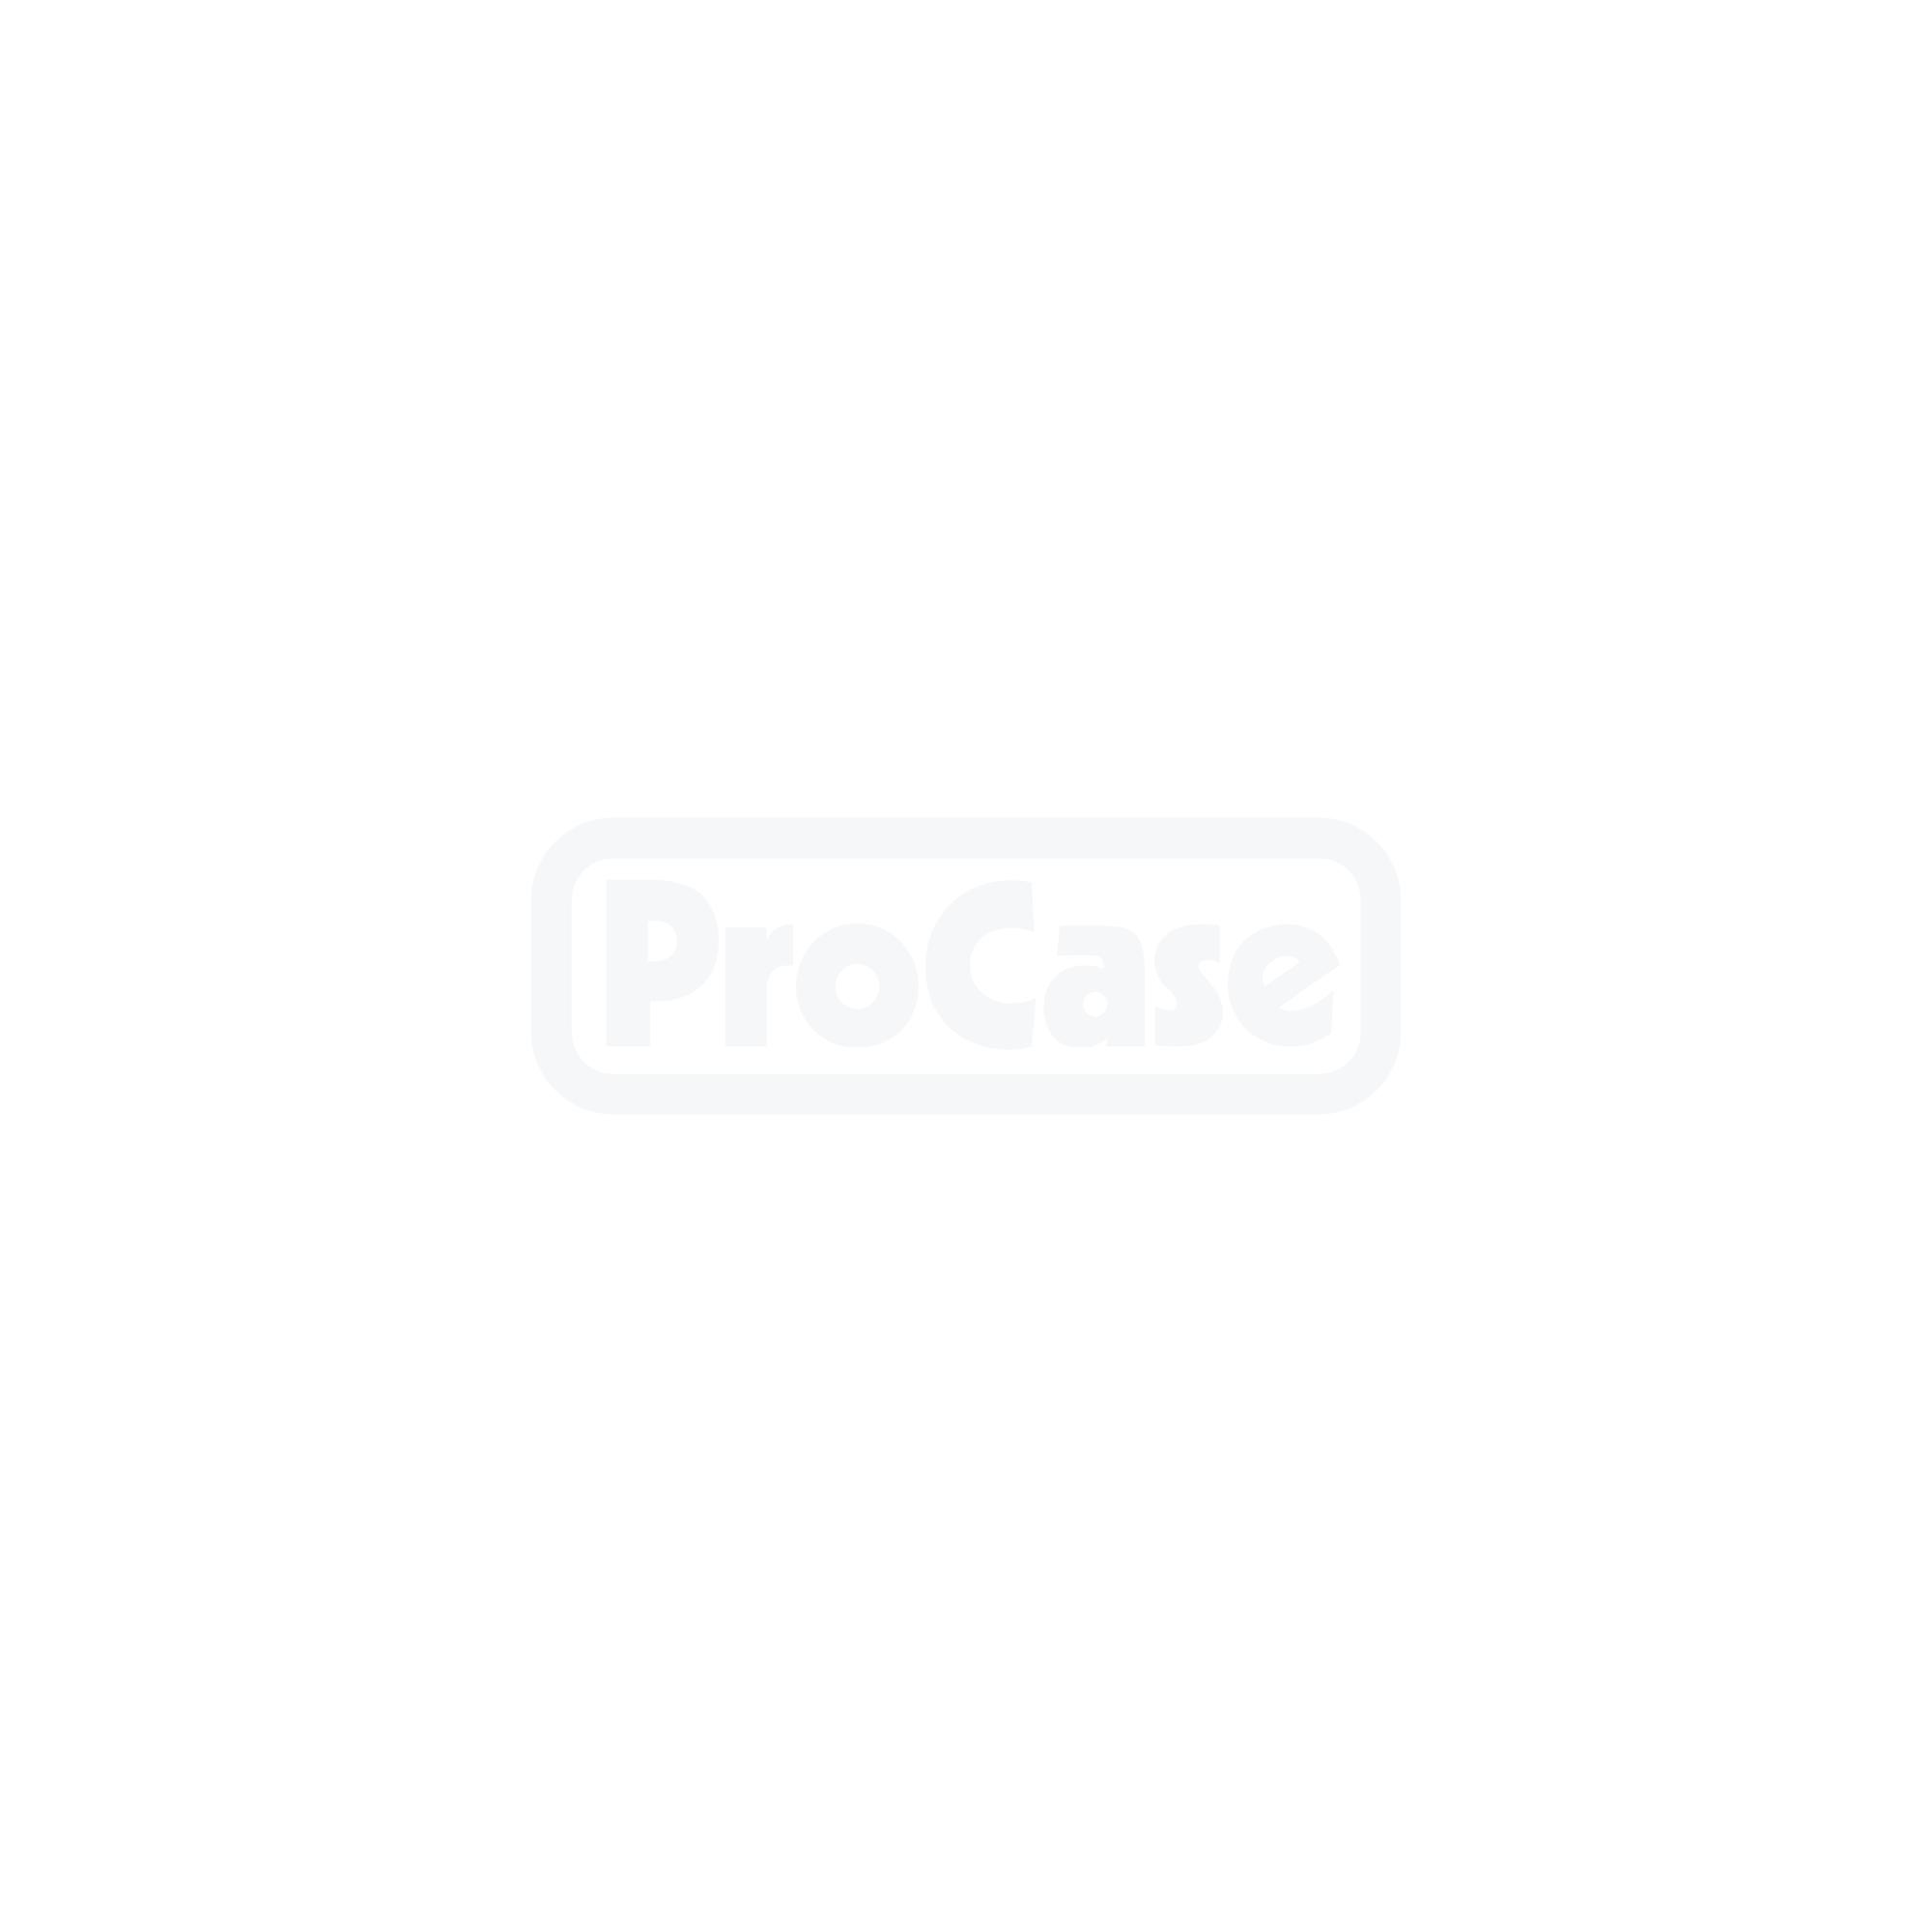 Stativ-Case / Hardware-Case 120 3